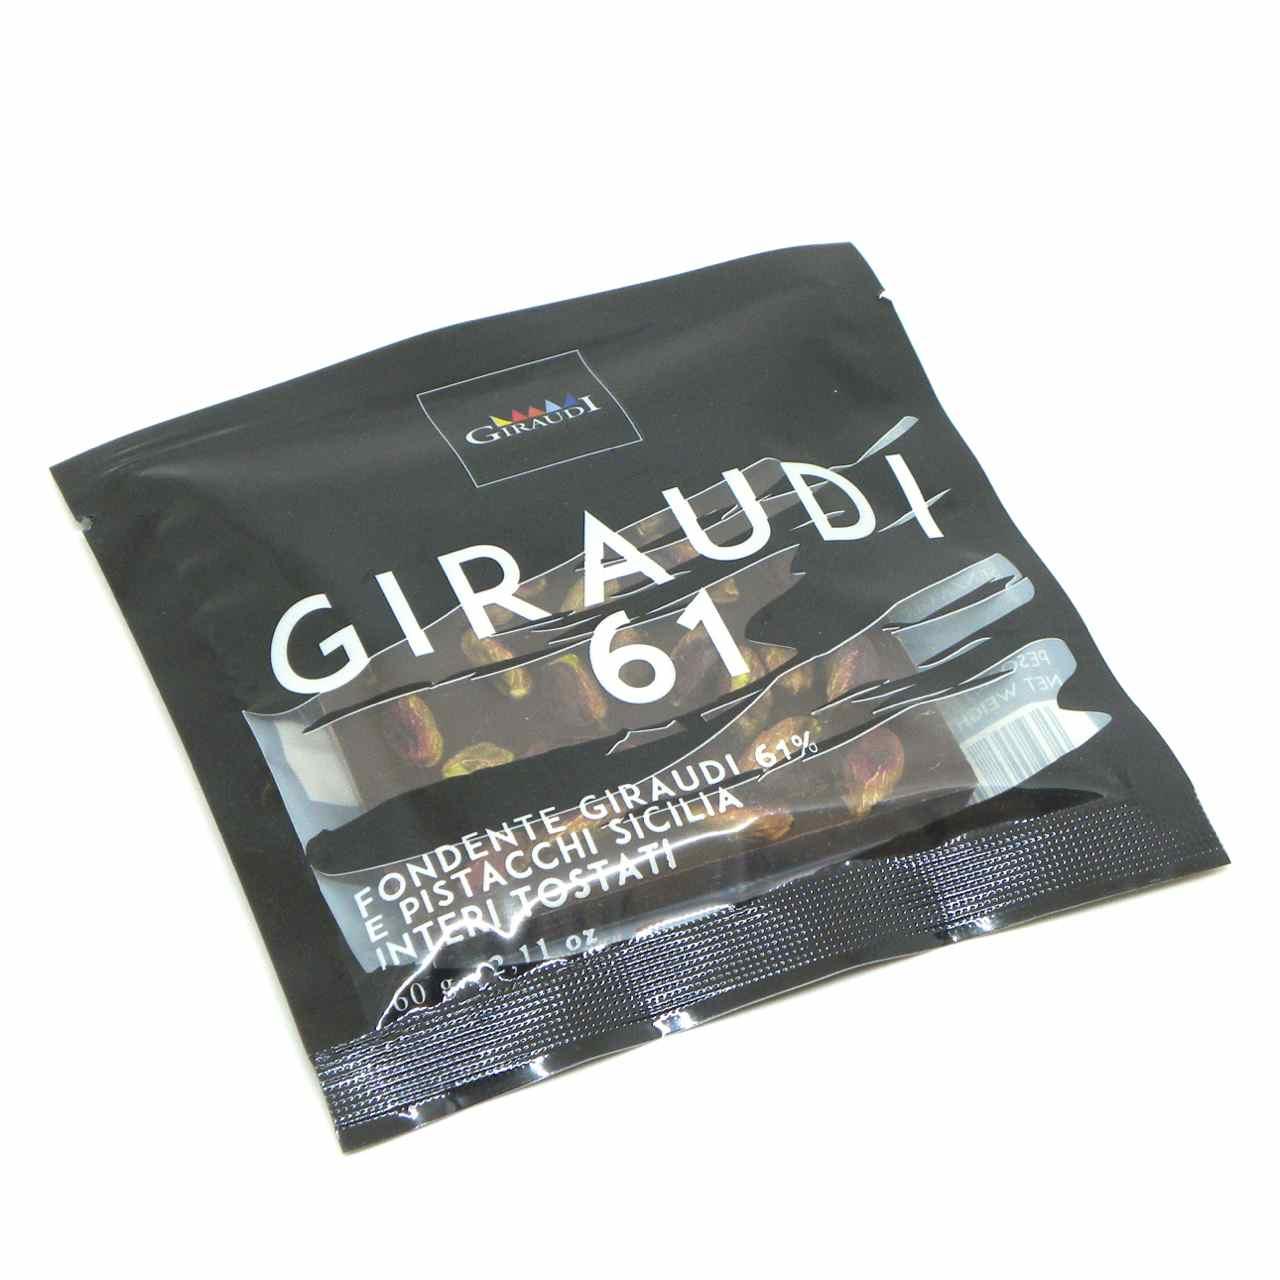 Giraudi tavoletta cioccolato fondente pistacchi – Giraudi dark chocolate bar pistachios – Gustorotondo – Italian food boutique